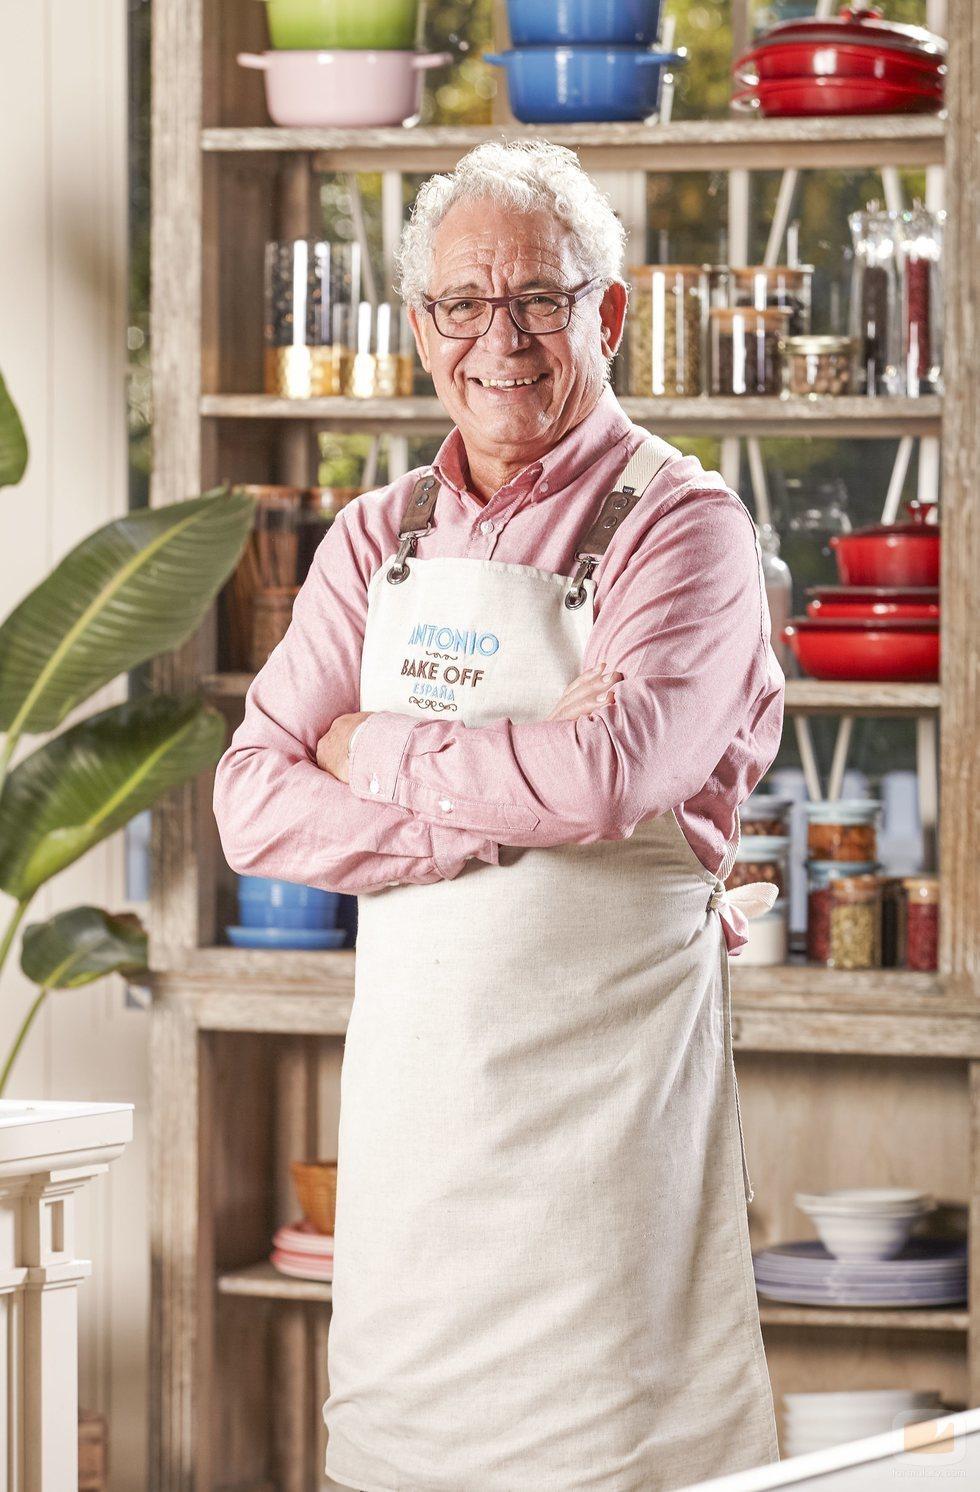 Antonio, concursante de 'Bake Off España'